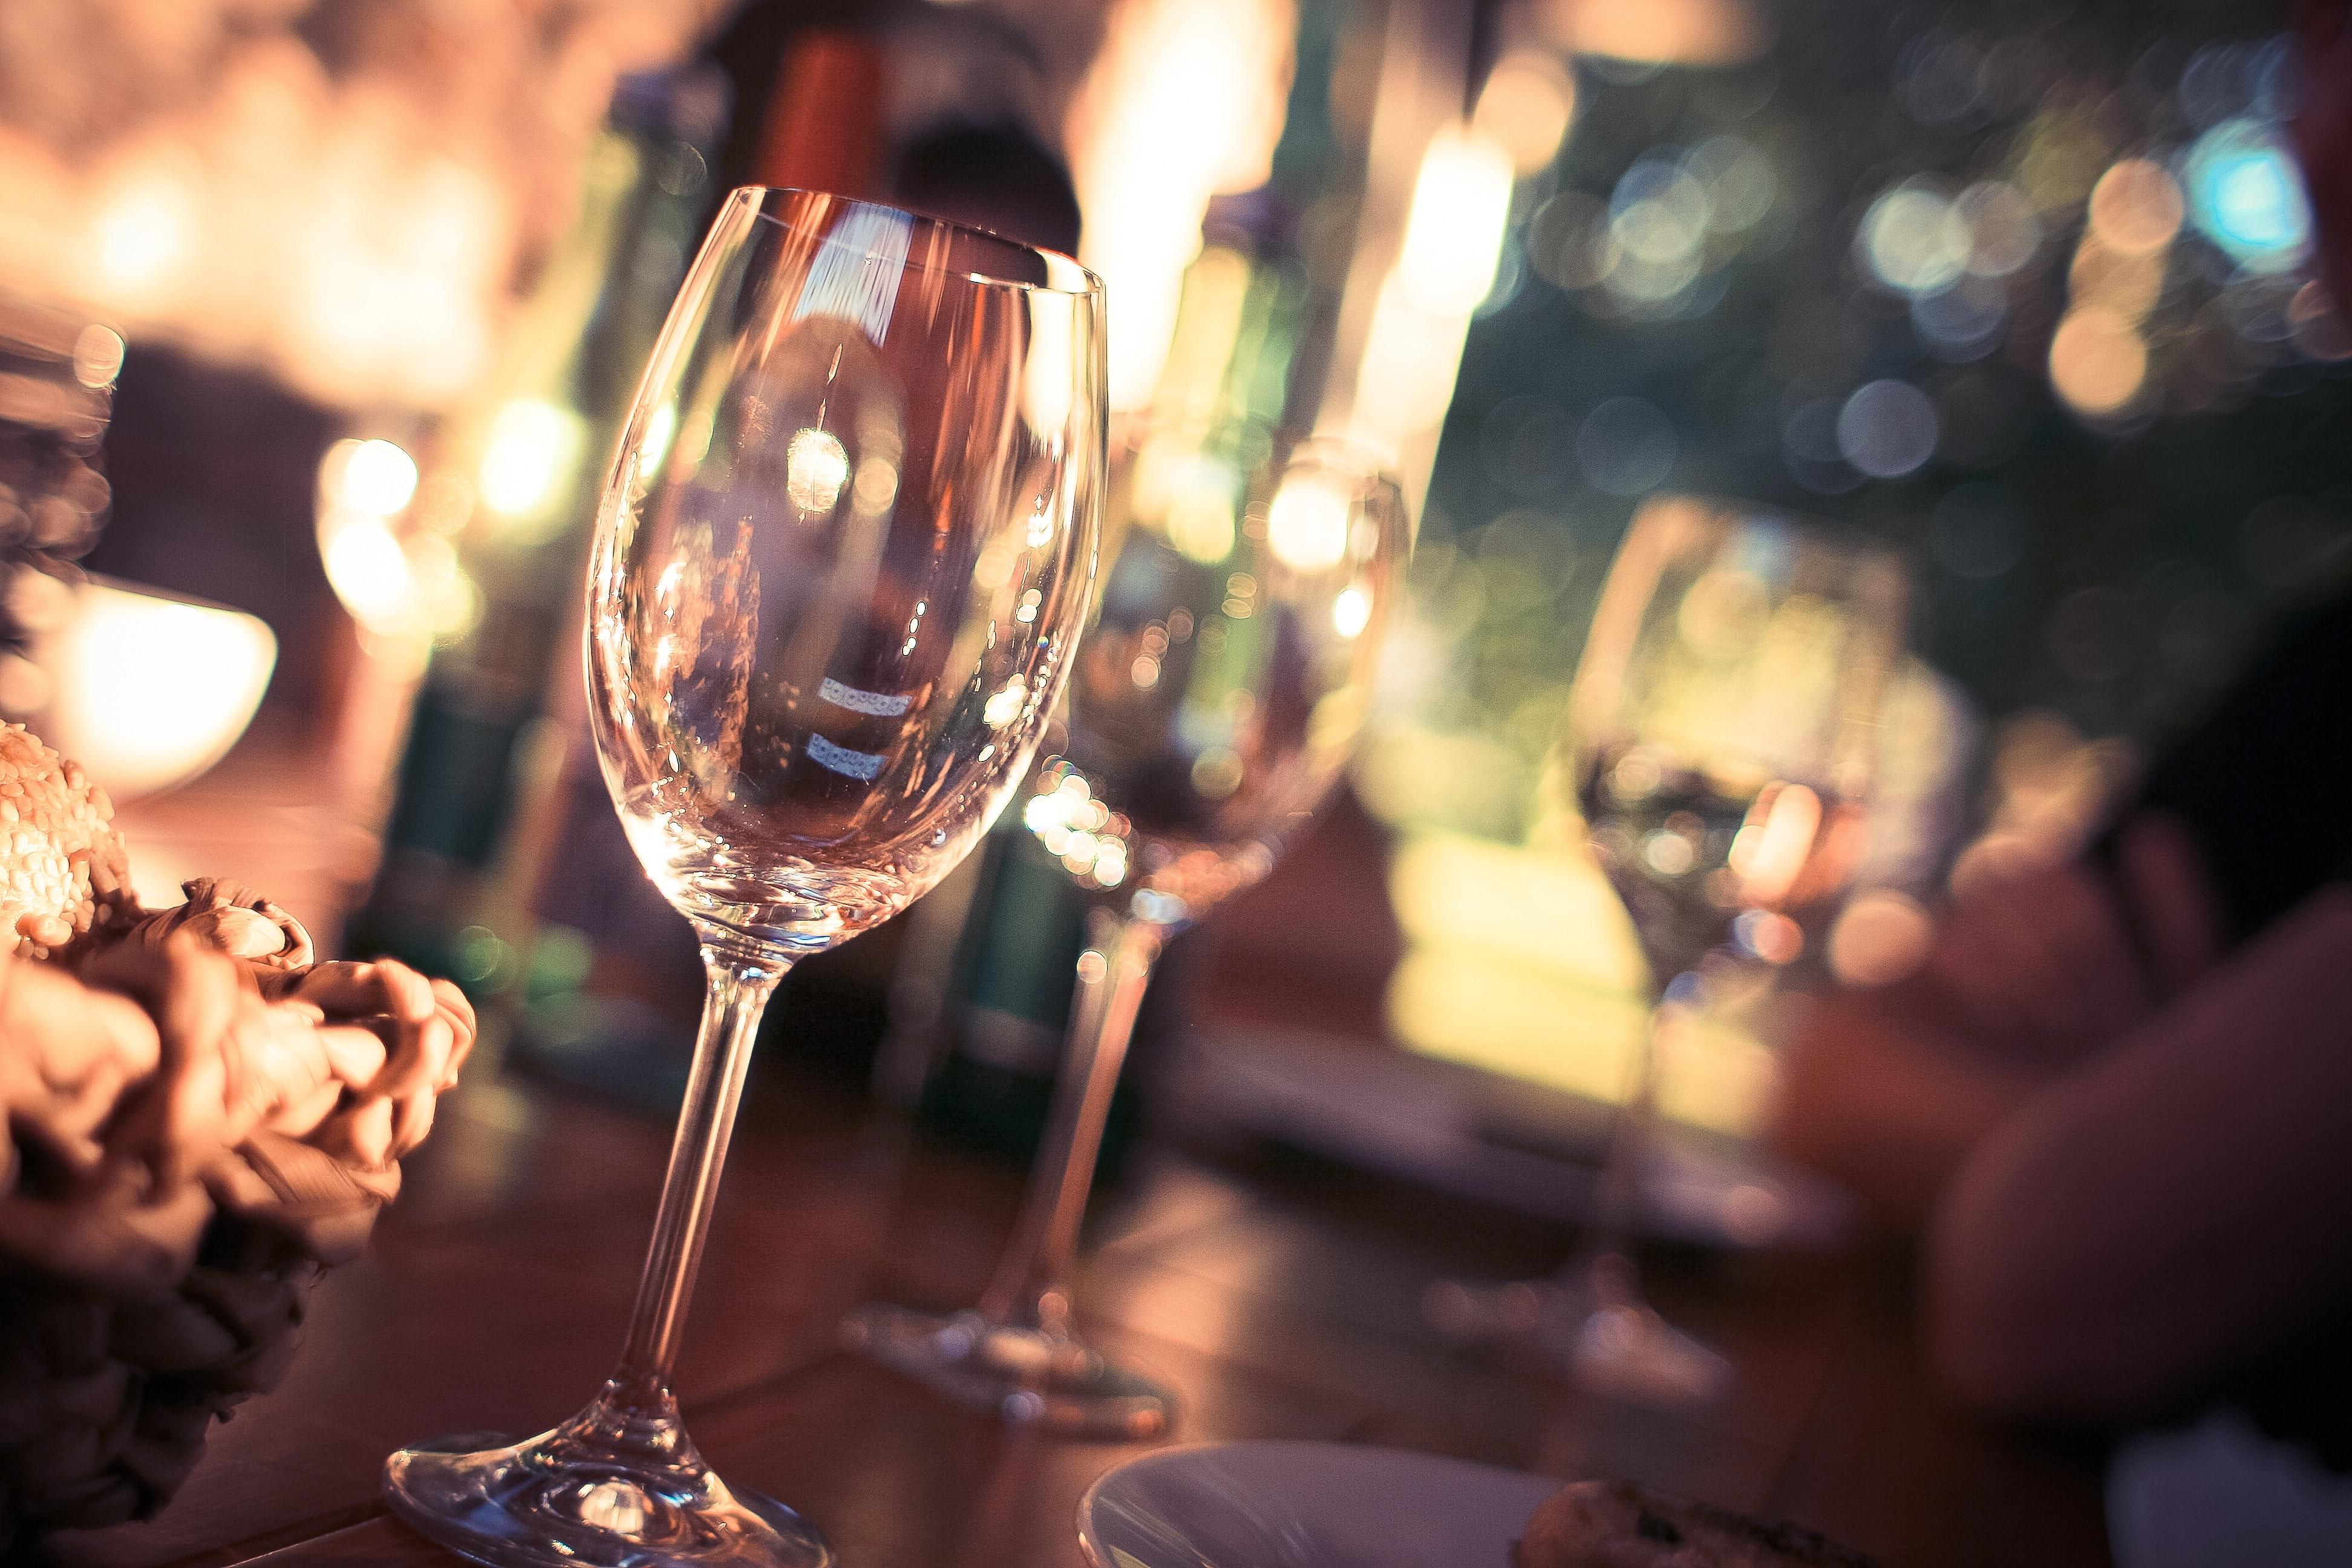 Wine glass on restaurant table photo